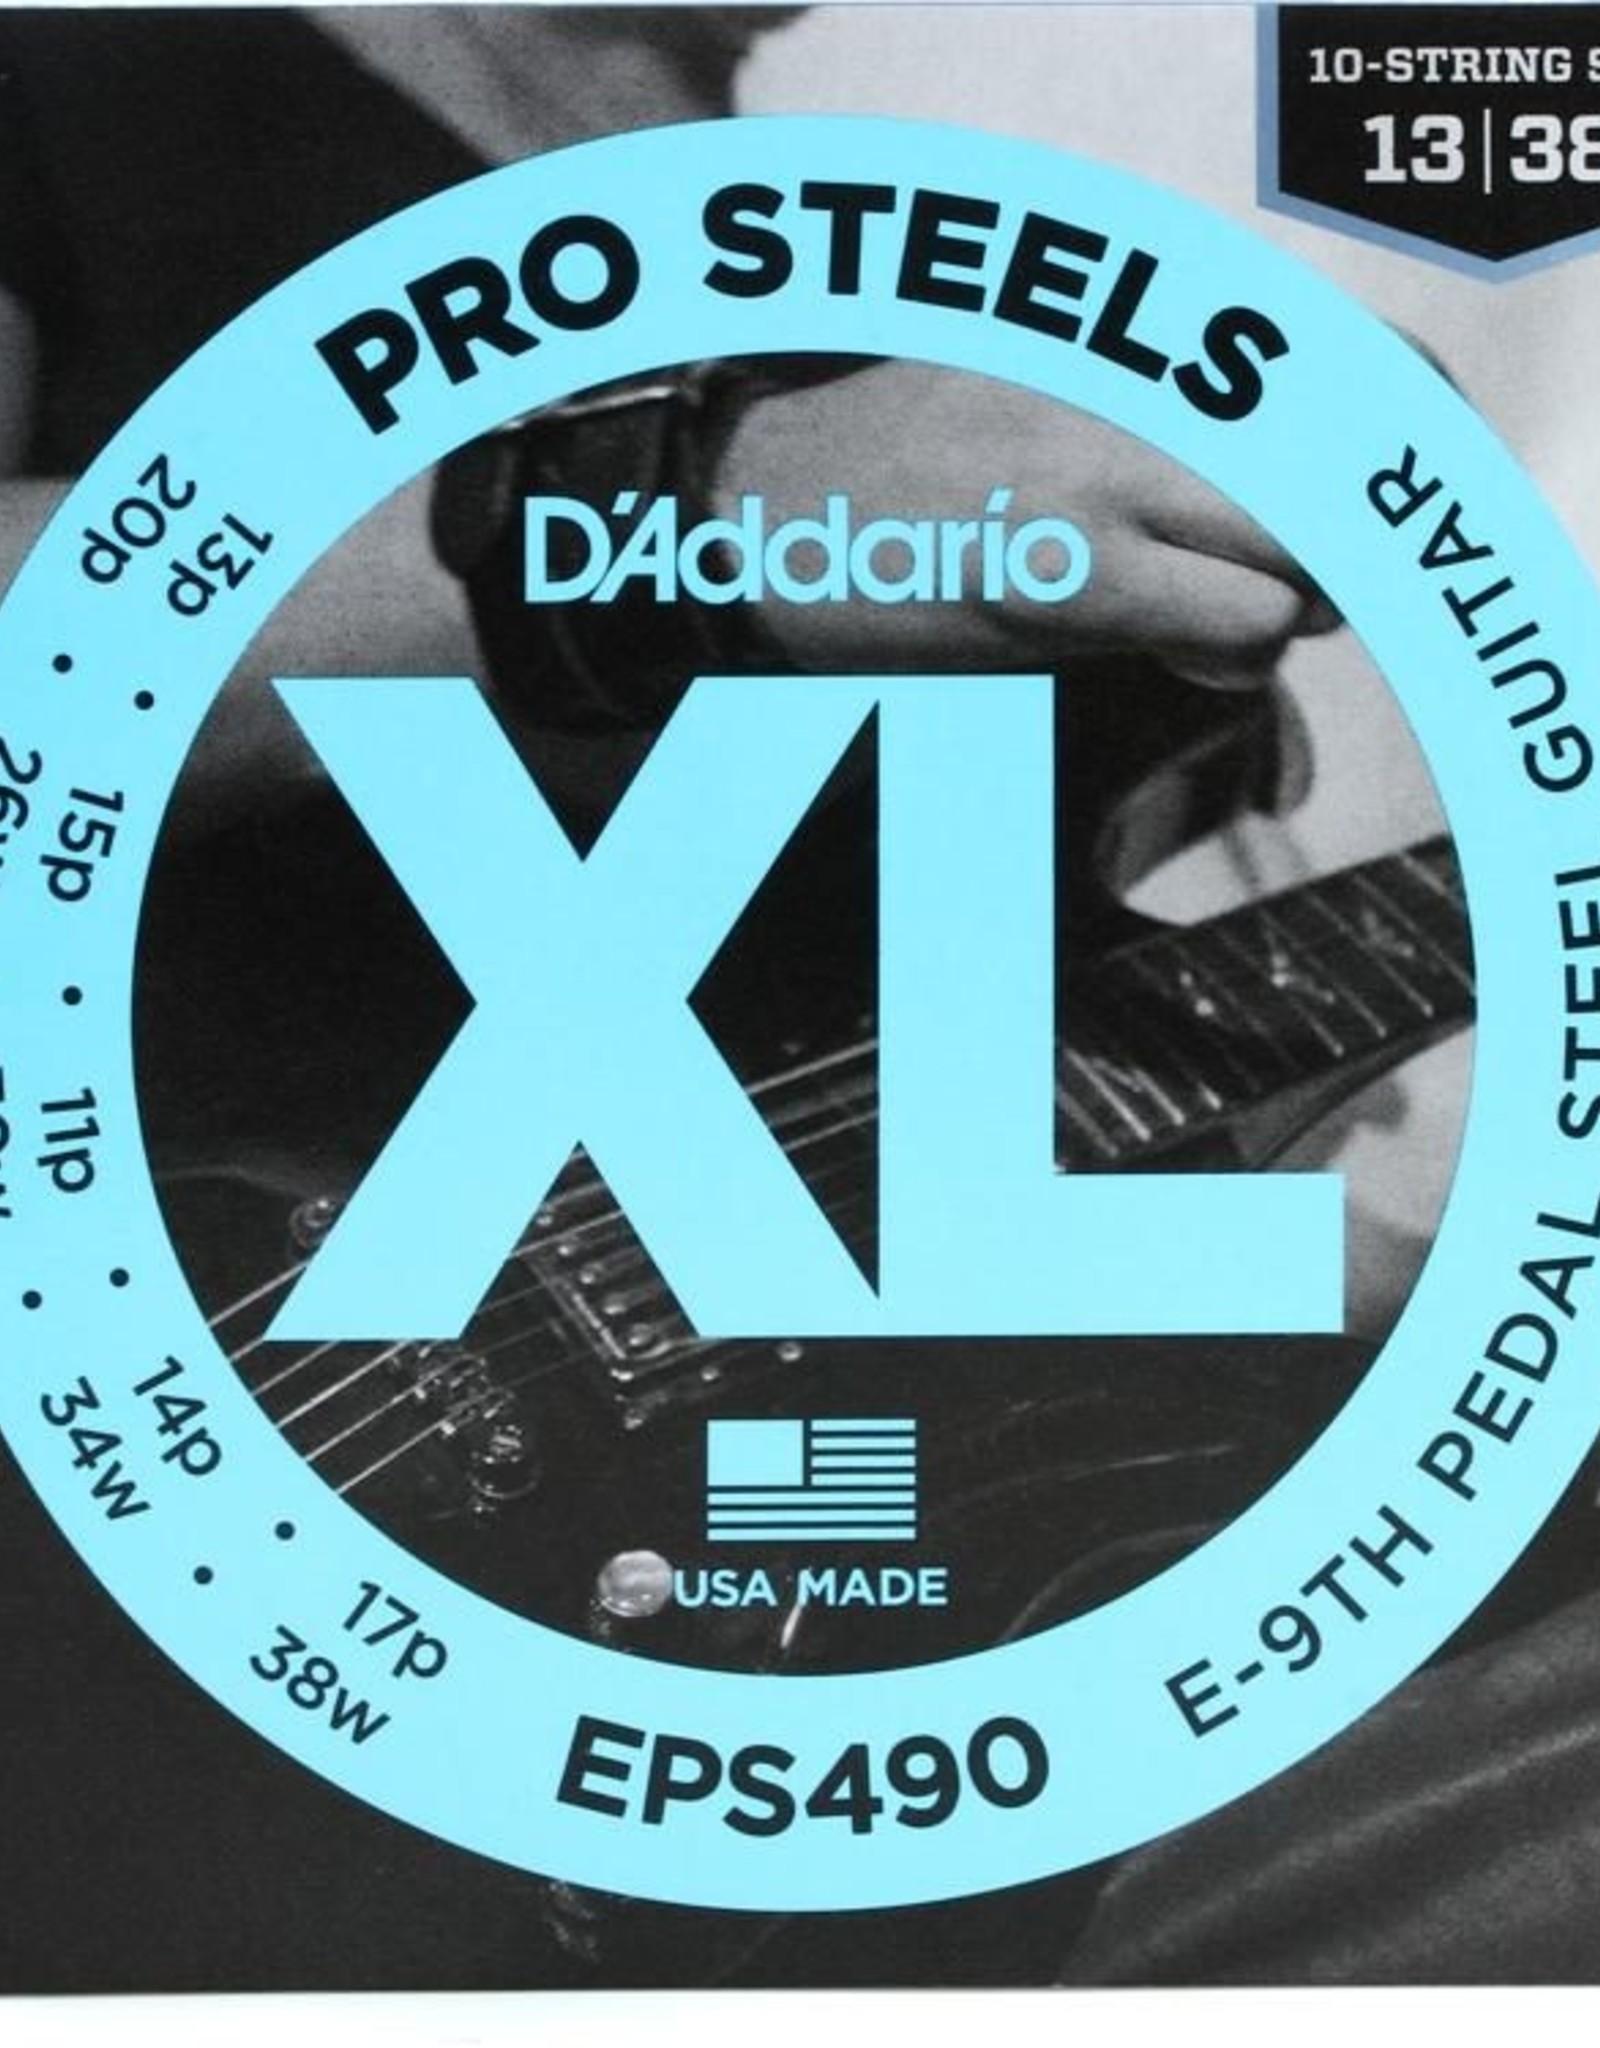 D'Addario D'Addario EPS490 Pro Steels Pedal Steel Strings, E-9th Steel Guitar